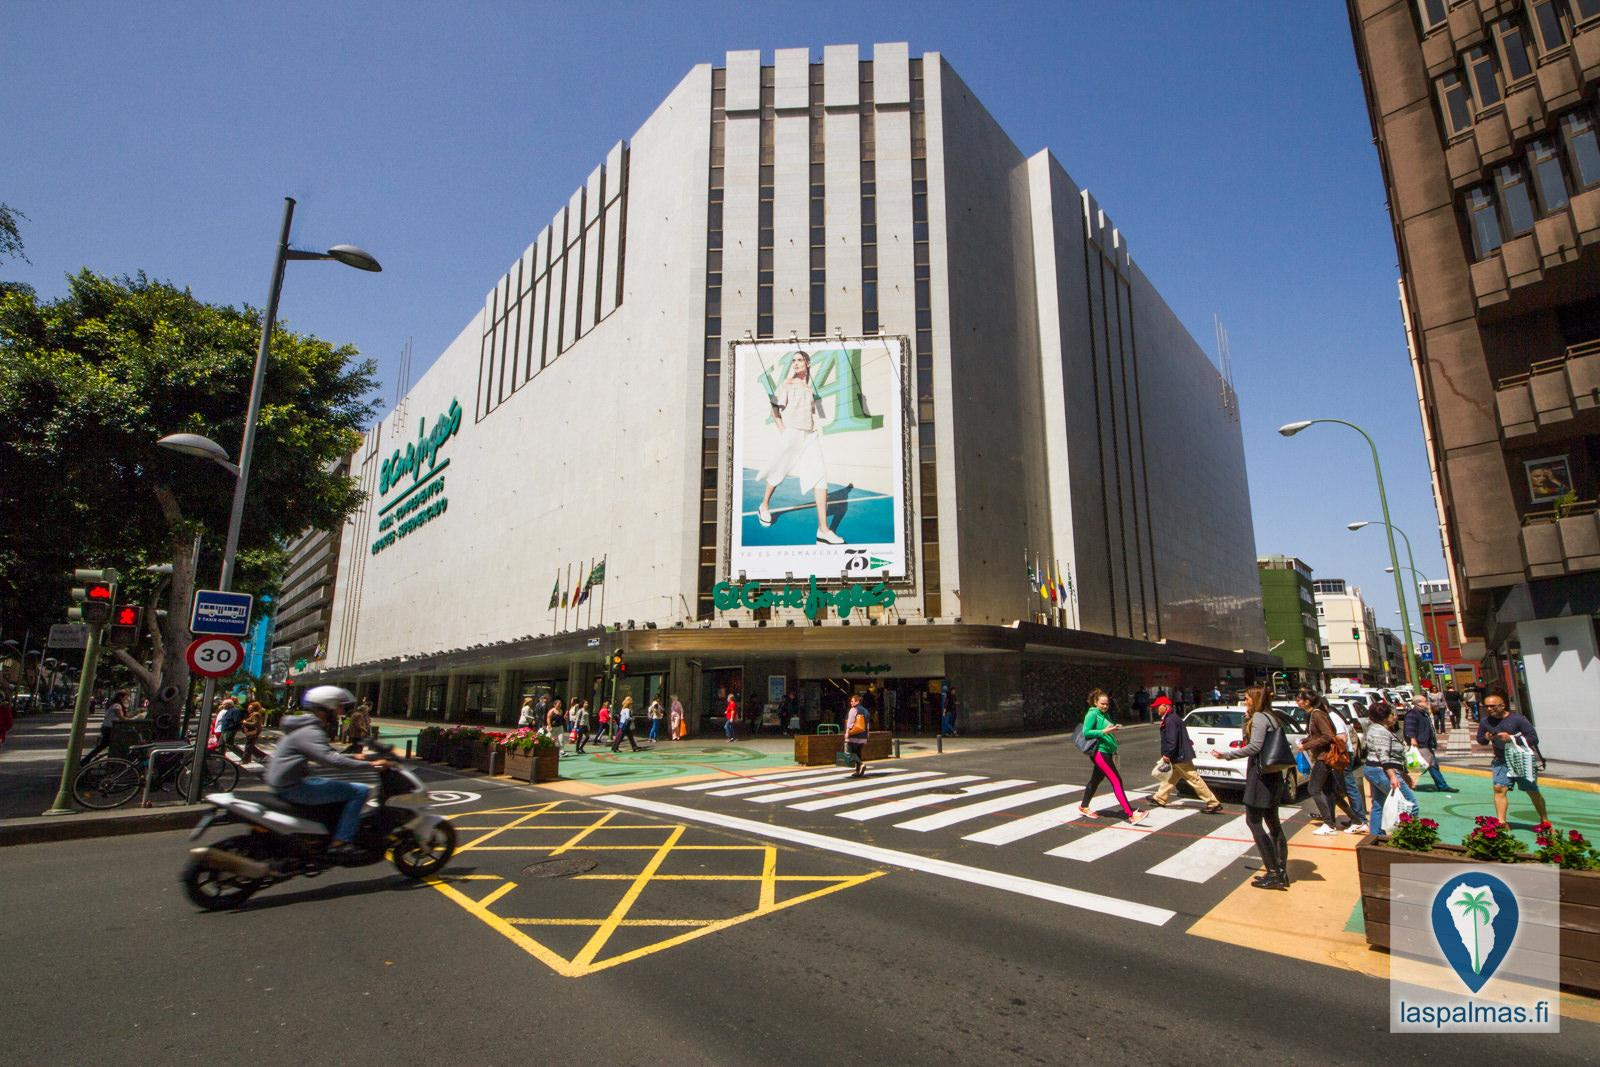 El Corte Ingl S Las Palmas